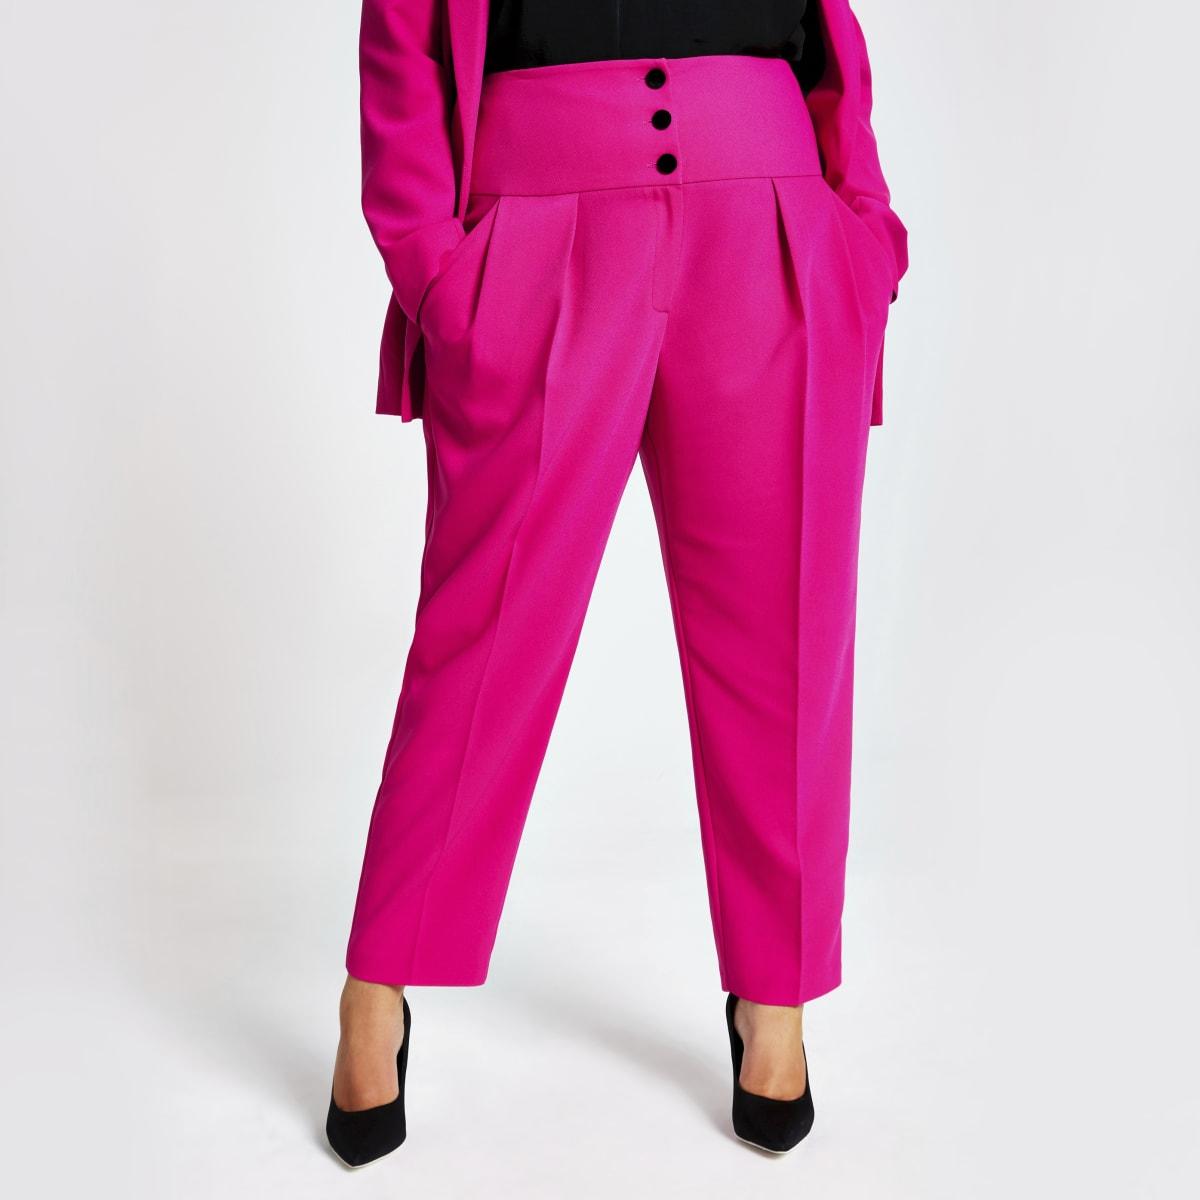 RI Plus - Roze broek met hoge korset taille